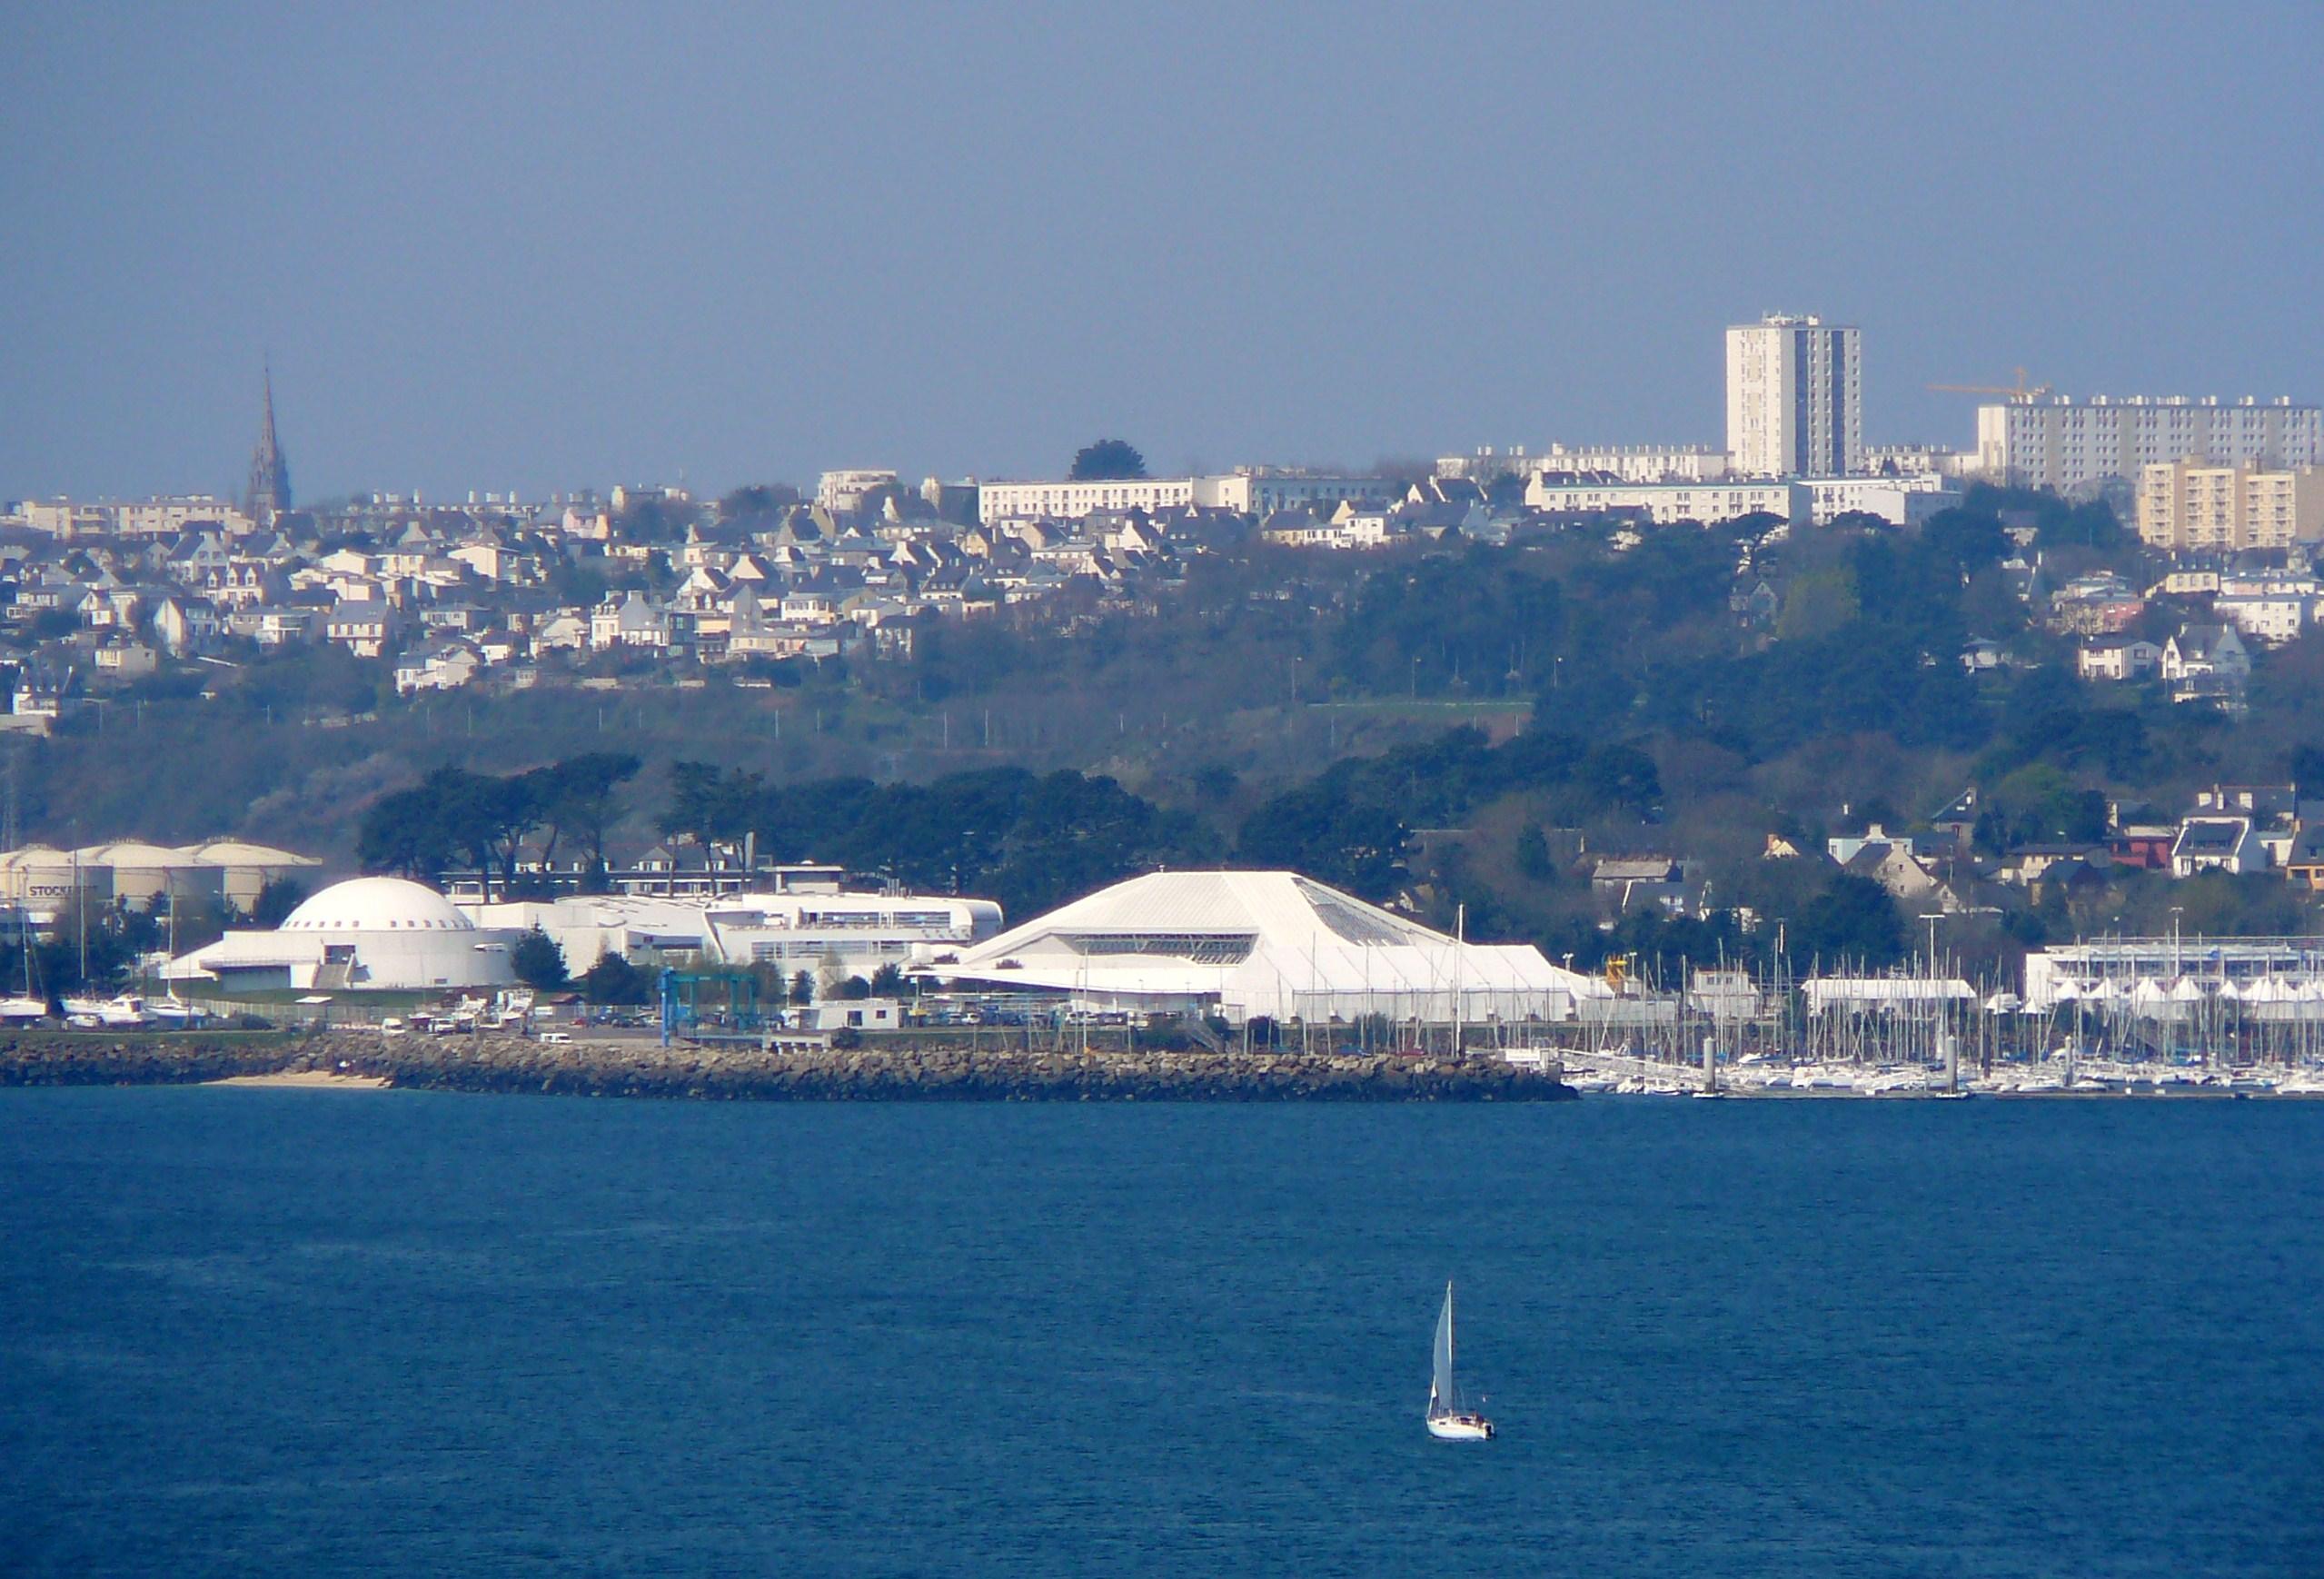 File:Oceanopolis dal ponte.JPG - Wikimedia Commons